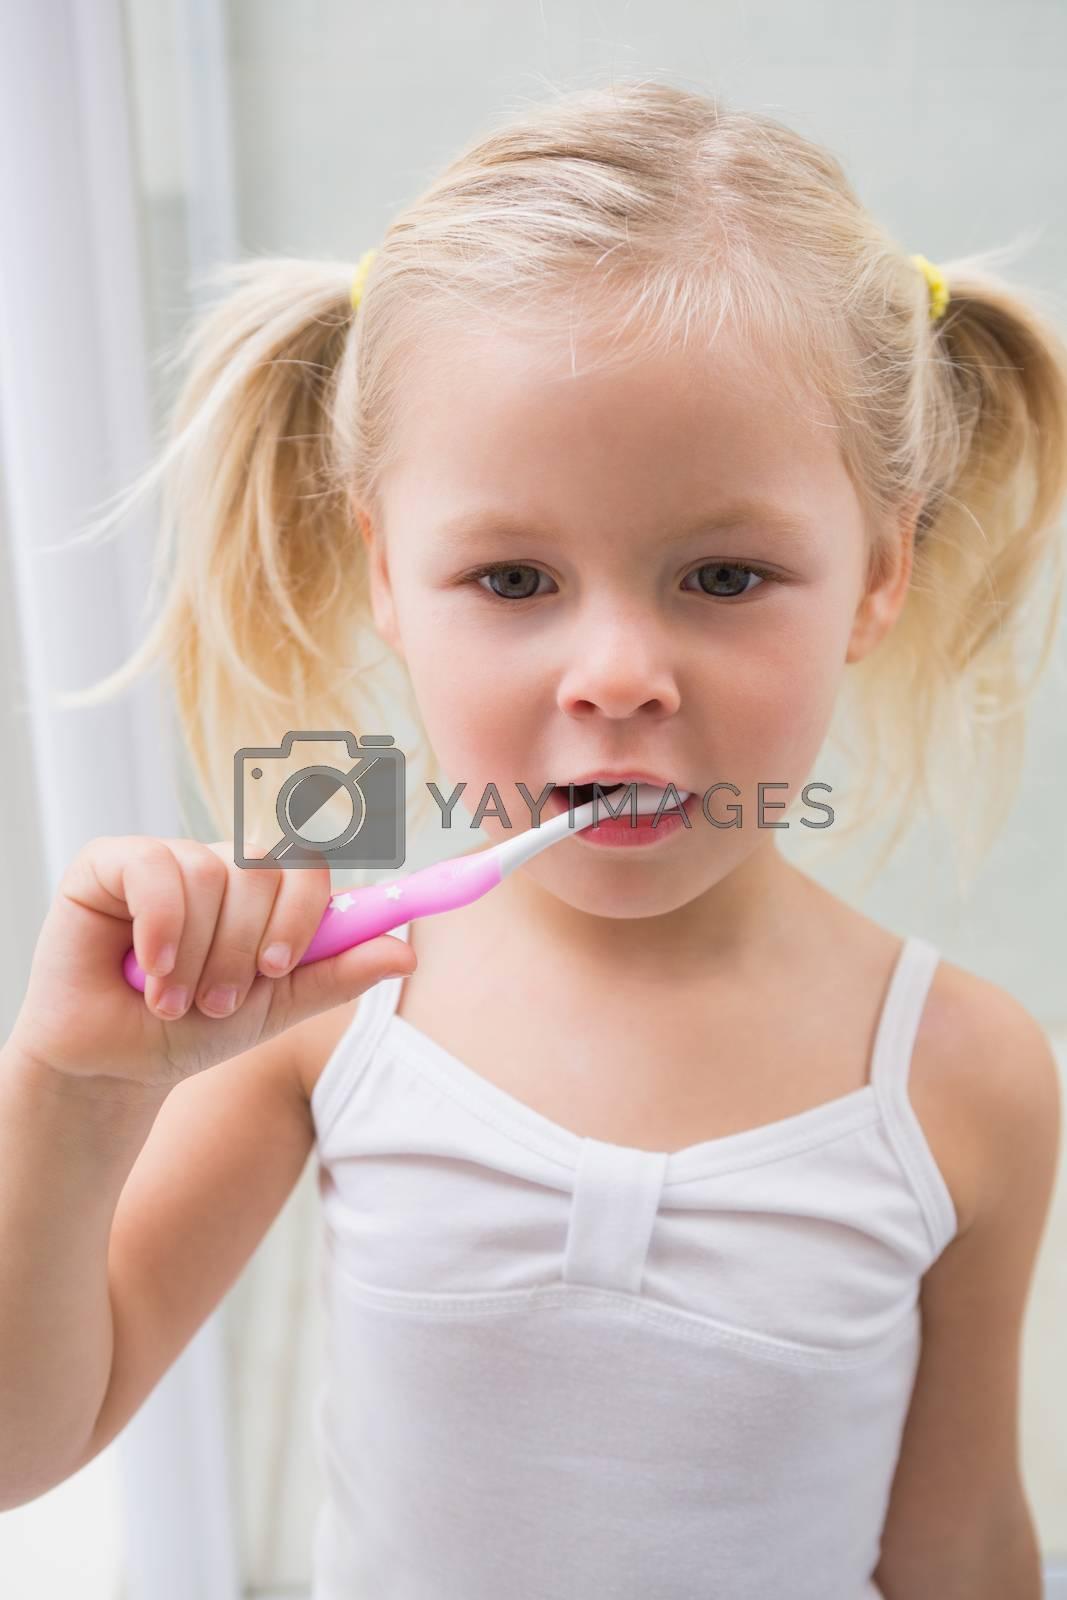 Cute girl brushing her teeth at home in the bathroom